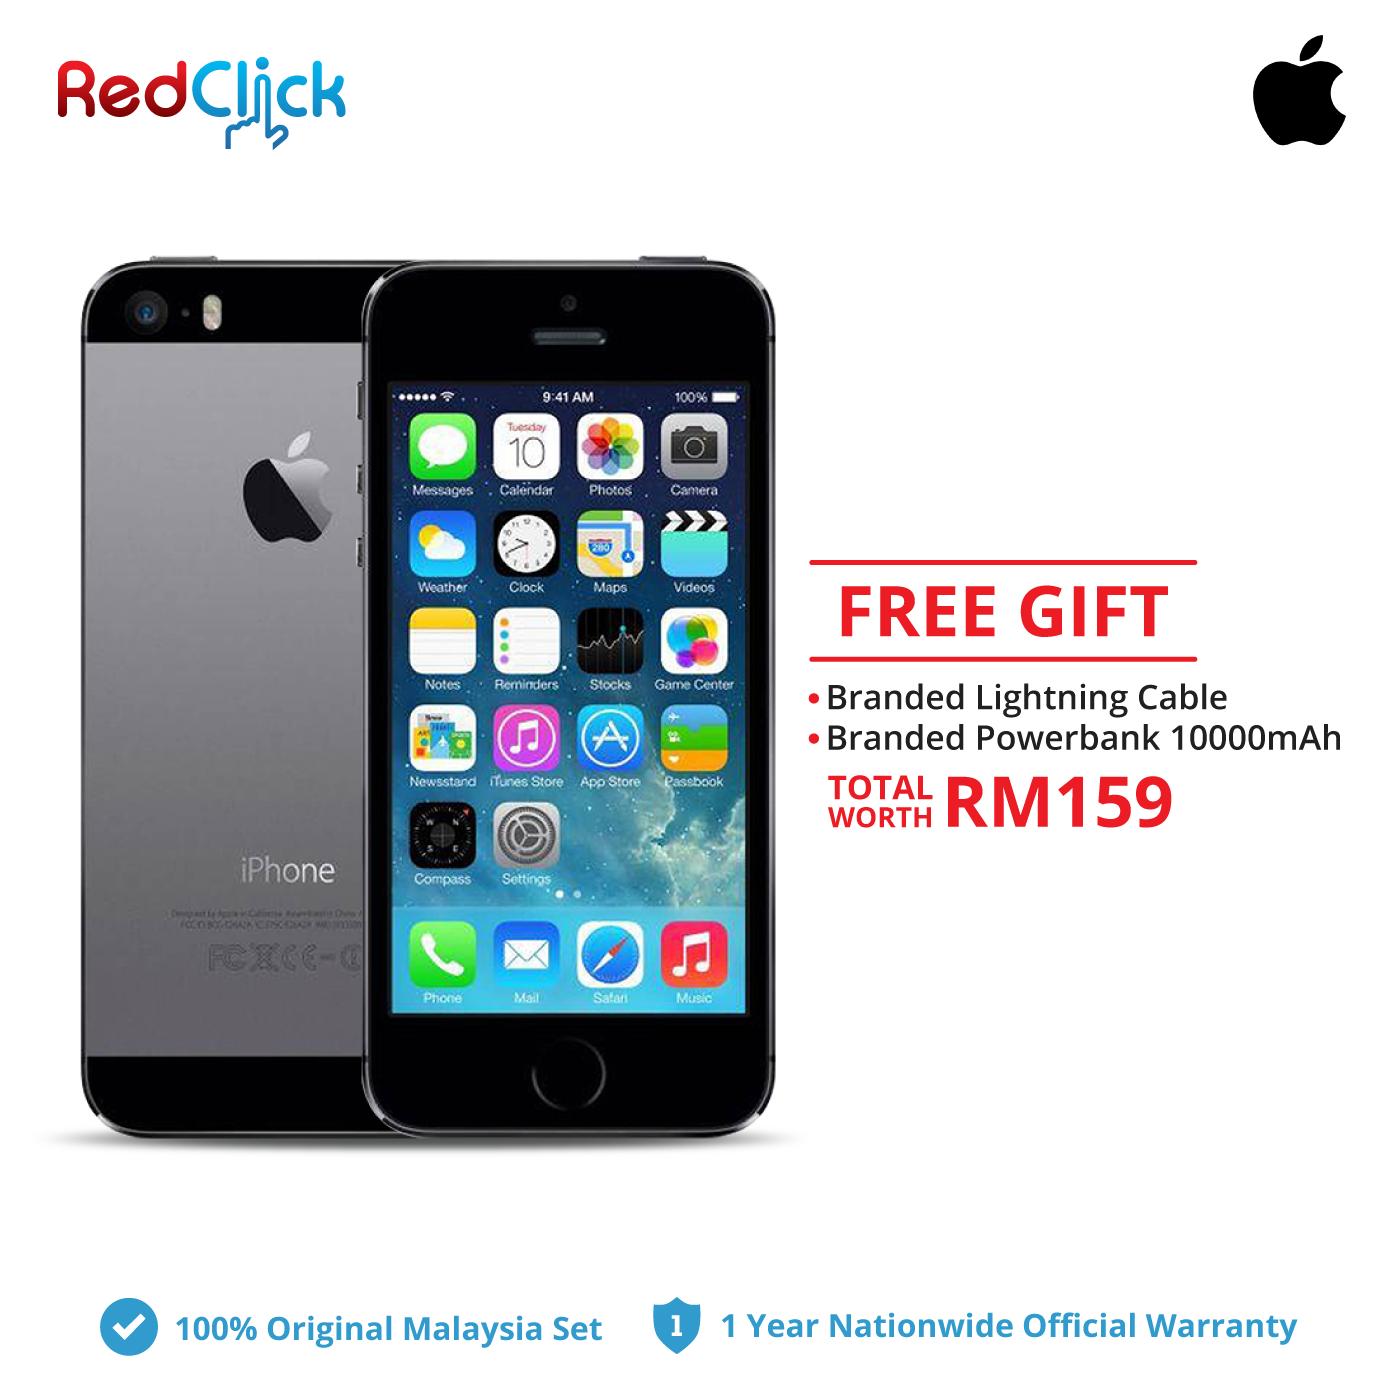 Iphone 5s Lightning Cable Original: Apple iPhone 5s (16GB ) Original Apple Malaysia Set + 2 Free Gift rh:redclick.com.my,Design